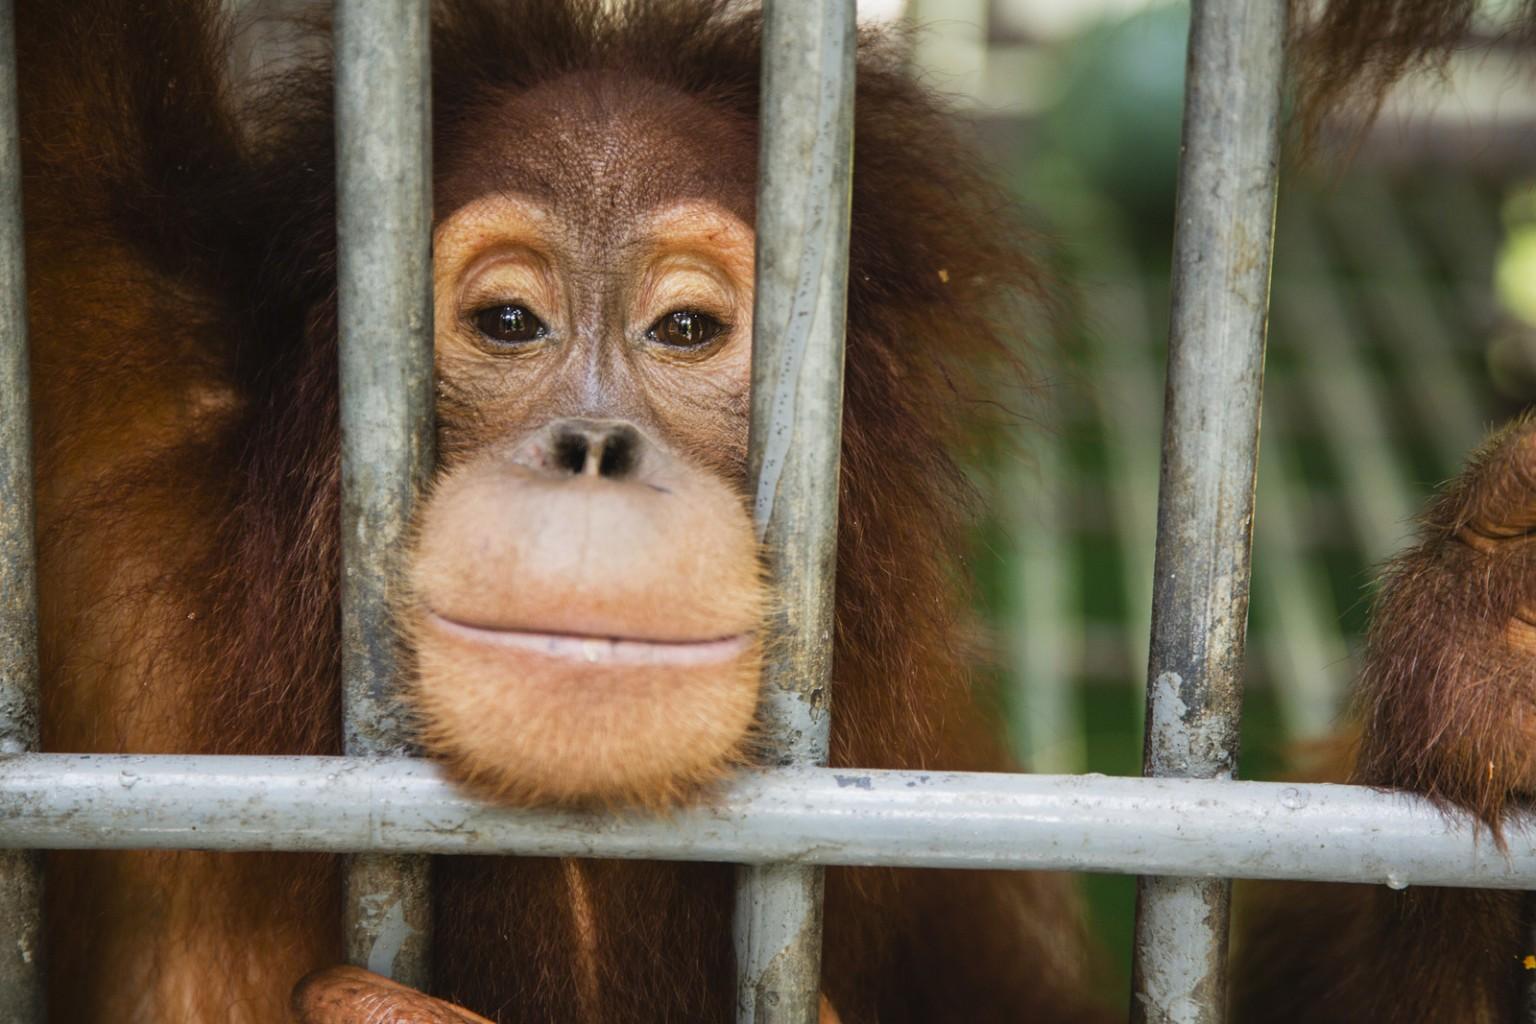 Image: Baby Orangutan peeking through bars of a cage